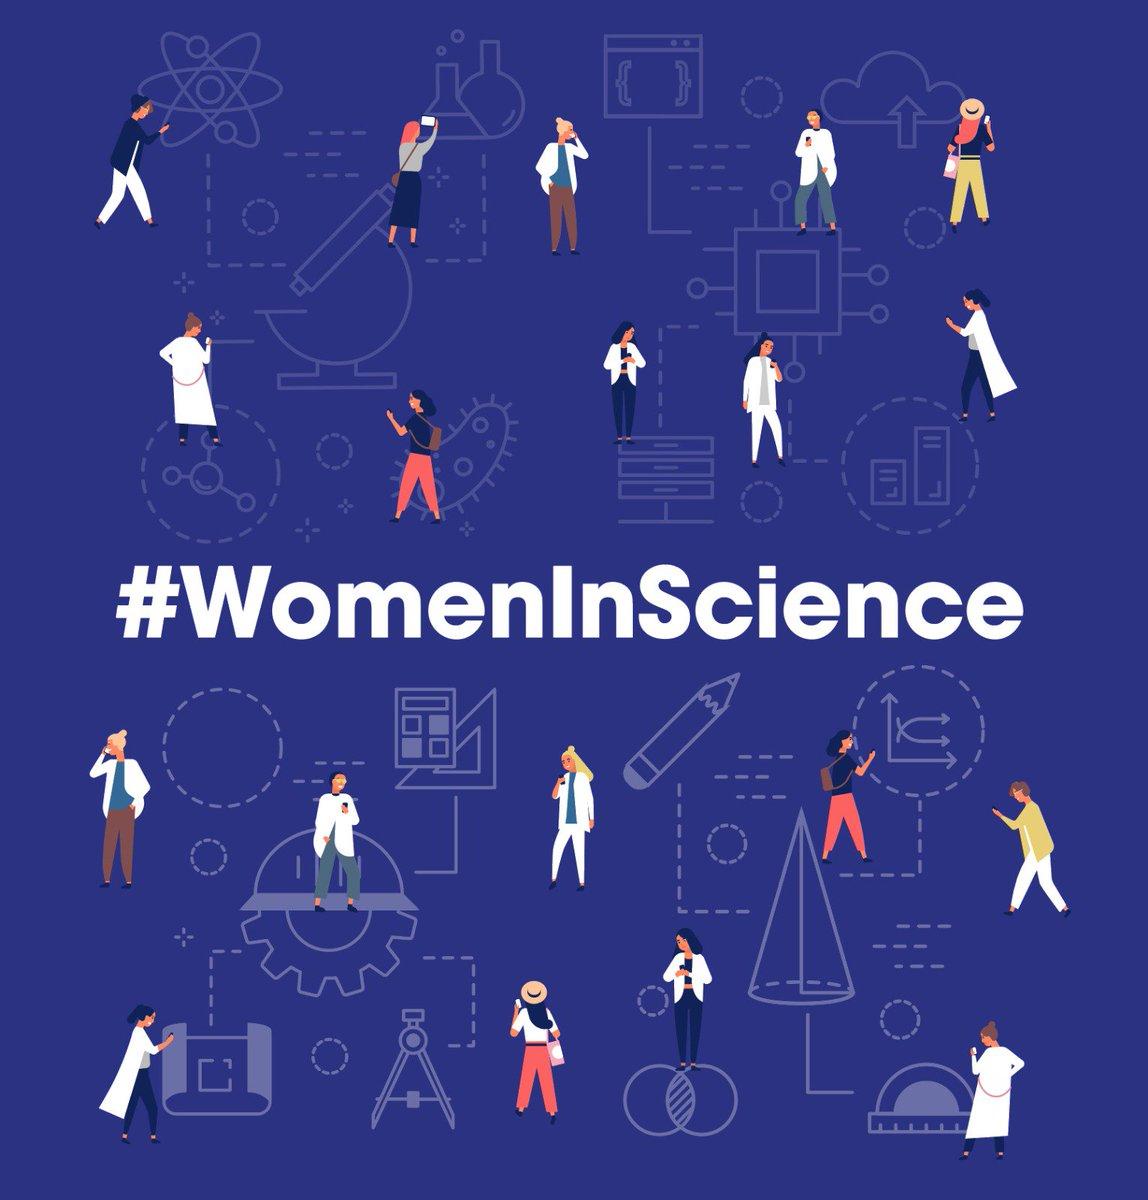 RO2019EU's photo on #FemmesEnScience